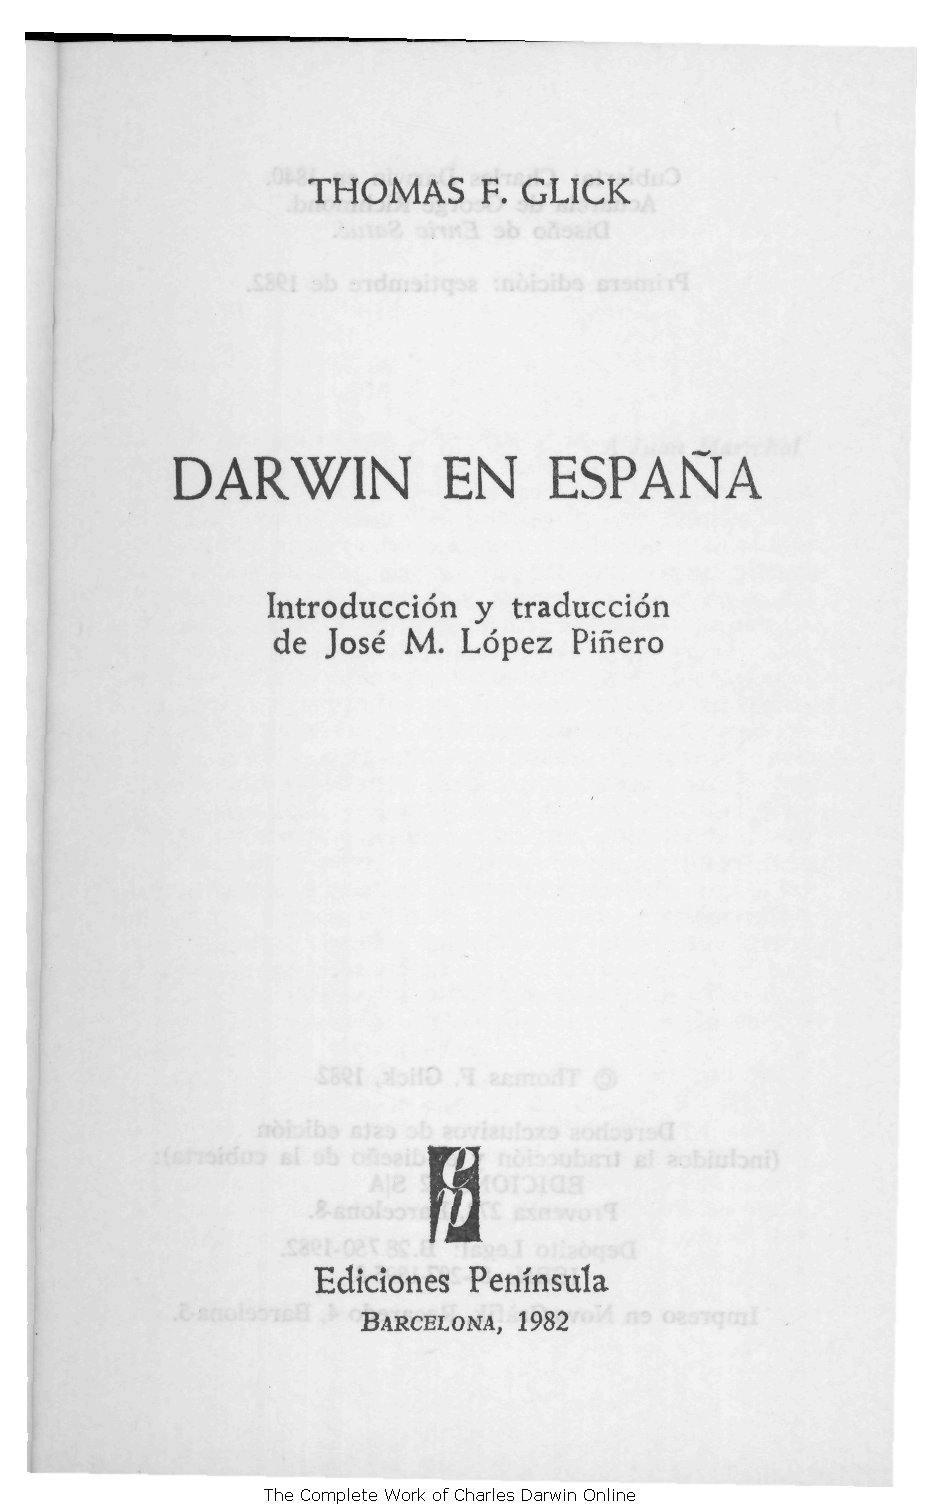 Glick, Thomas F. 1982. Darwin en España. Barcelona: Col. Libros de ...